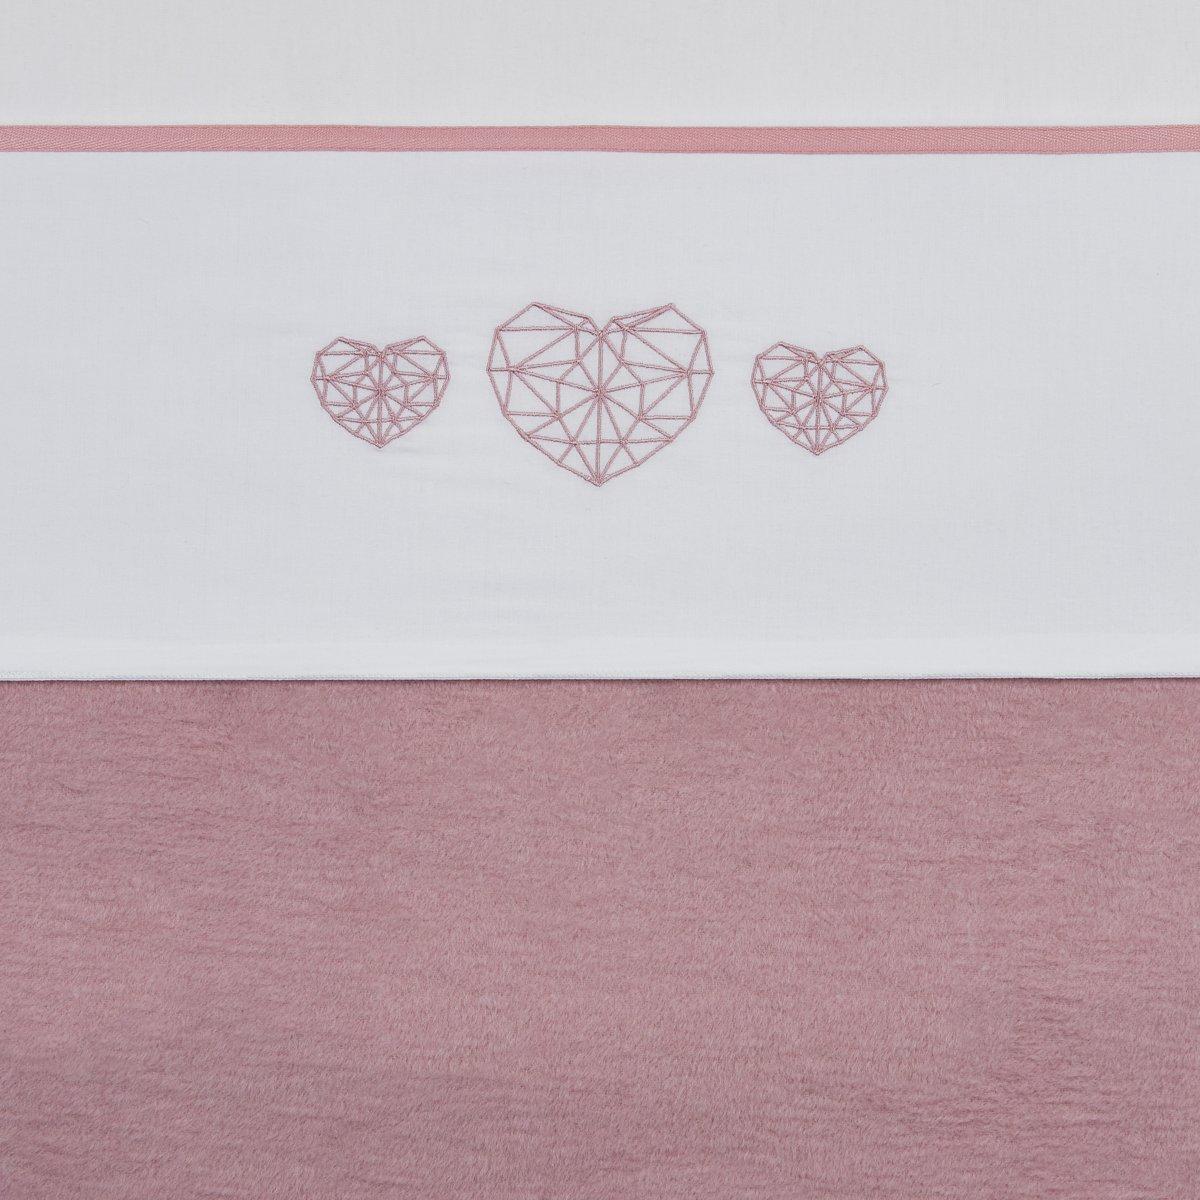 Meyco ledikantlaken Geometric Heart - 100 x 150 cm - oudroze